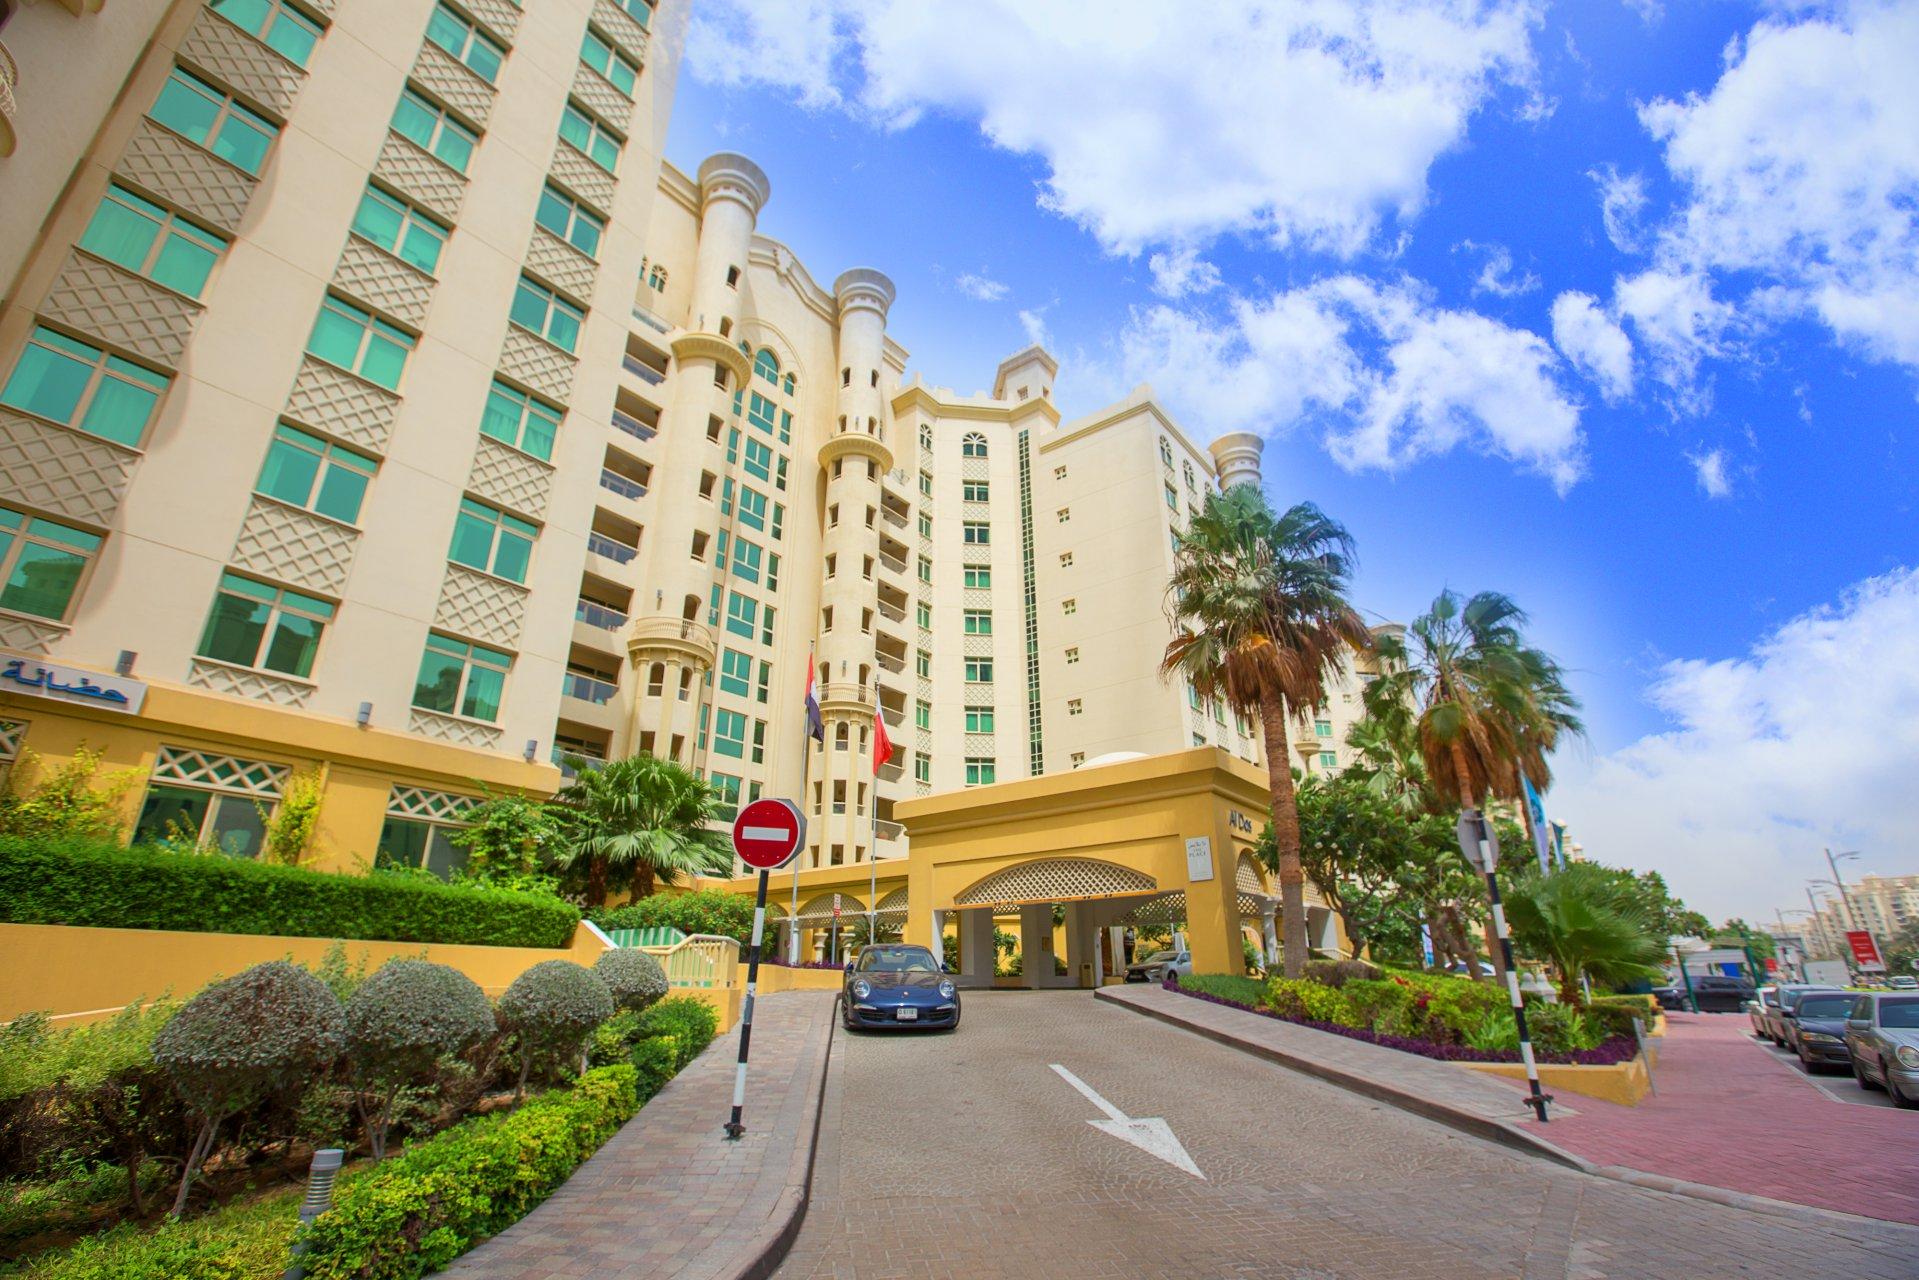 Ad Rental Apartment Palm Jumeirah Shoreline Apartments ref ...